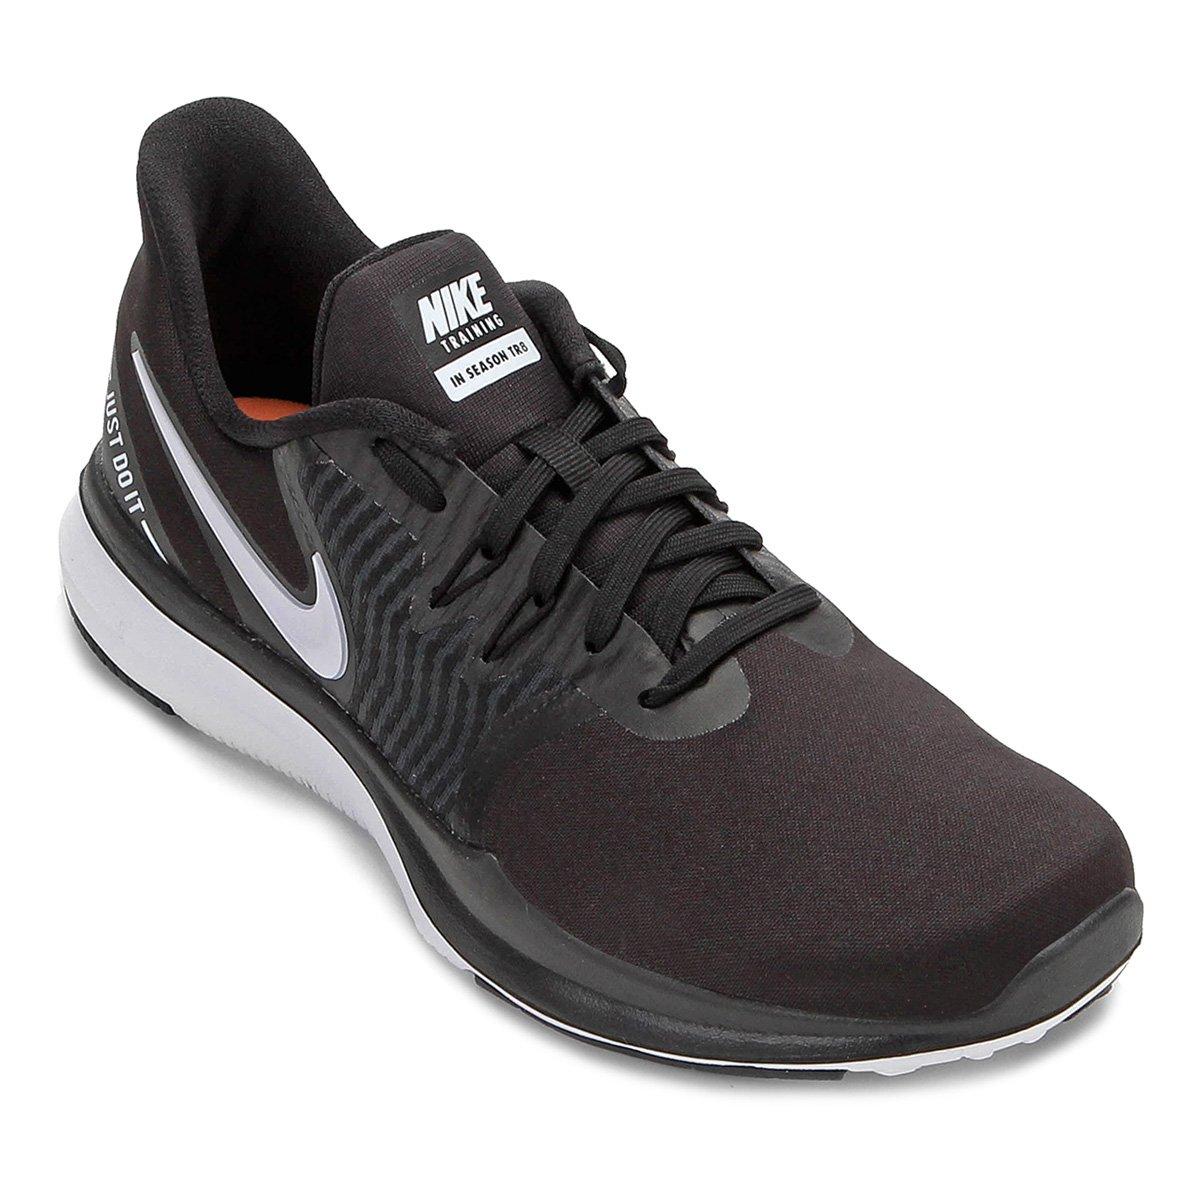 Tênis Nike In-Season Tr 8 Feminino - Preto e Branco - Compre Agora ... 007ee0c6e1039